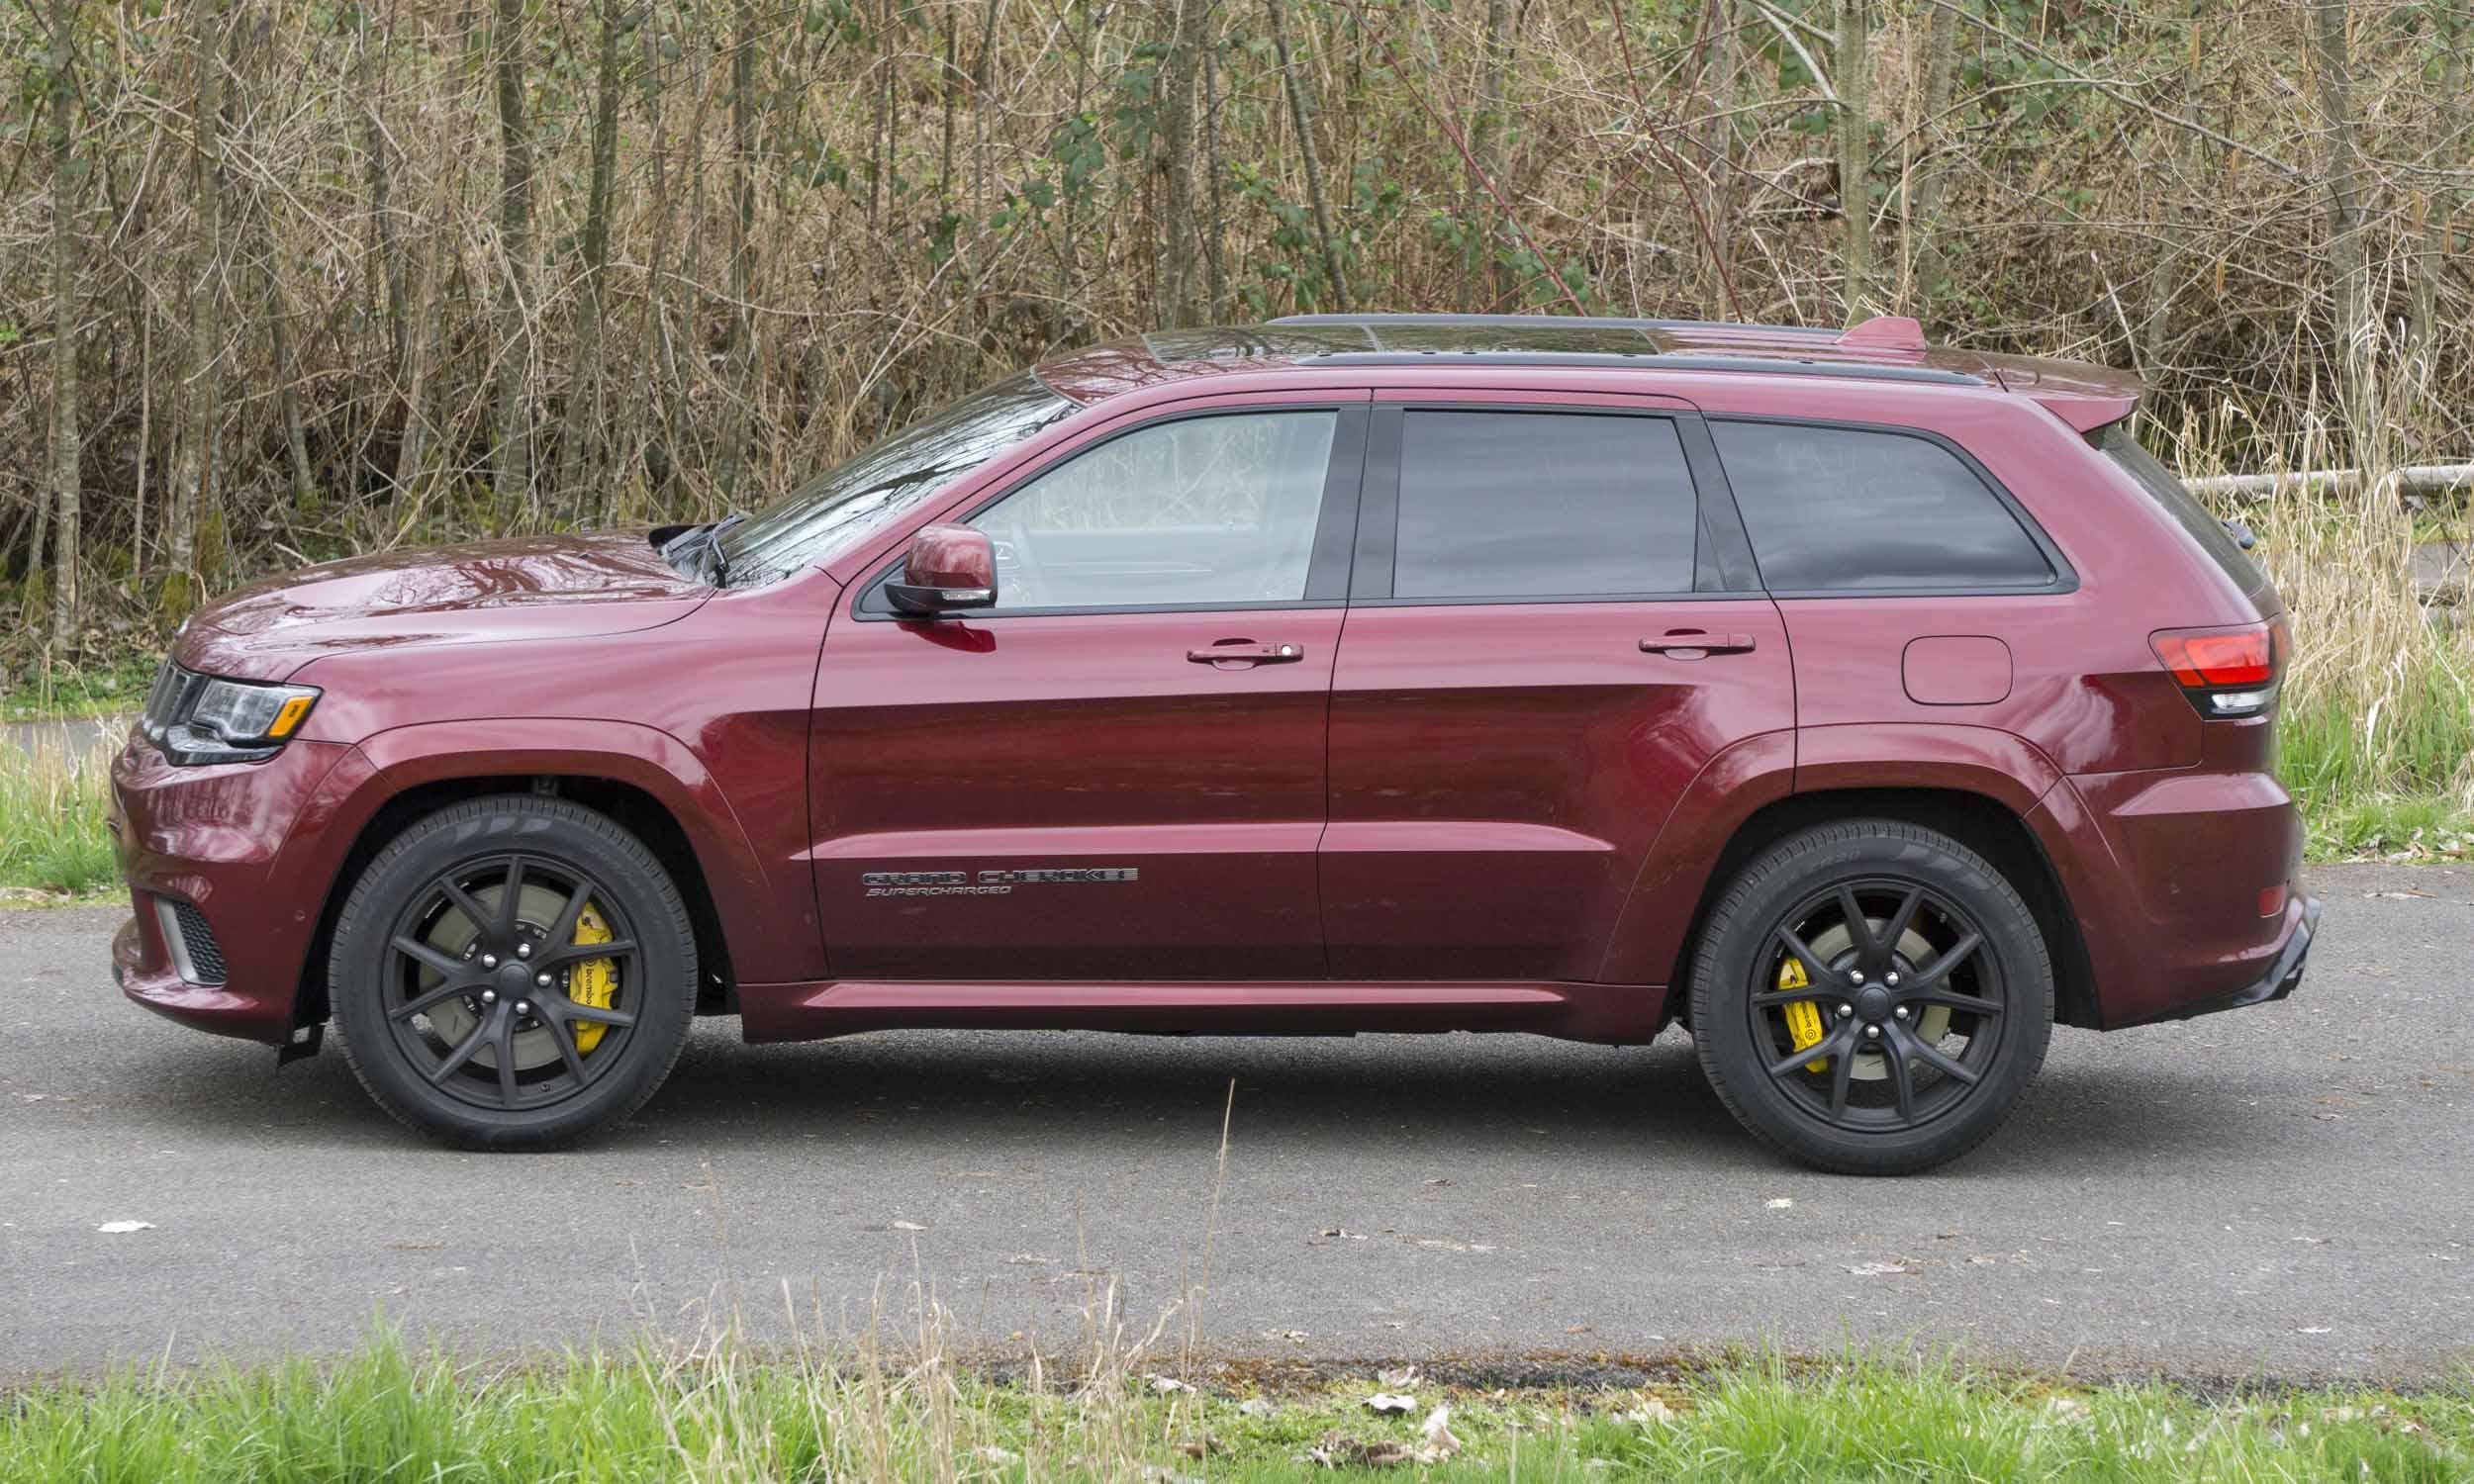 2018 jeep grand cherokee trackhawk review autonxt. Black Bedroom Furniture Sets. Home Design Ideas